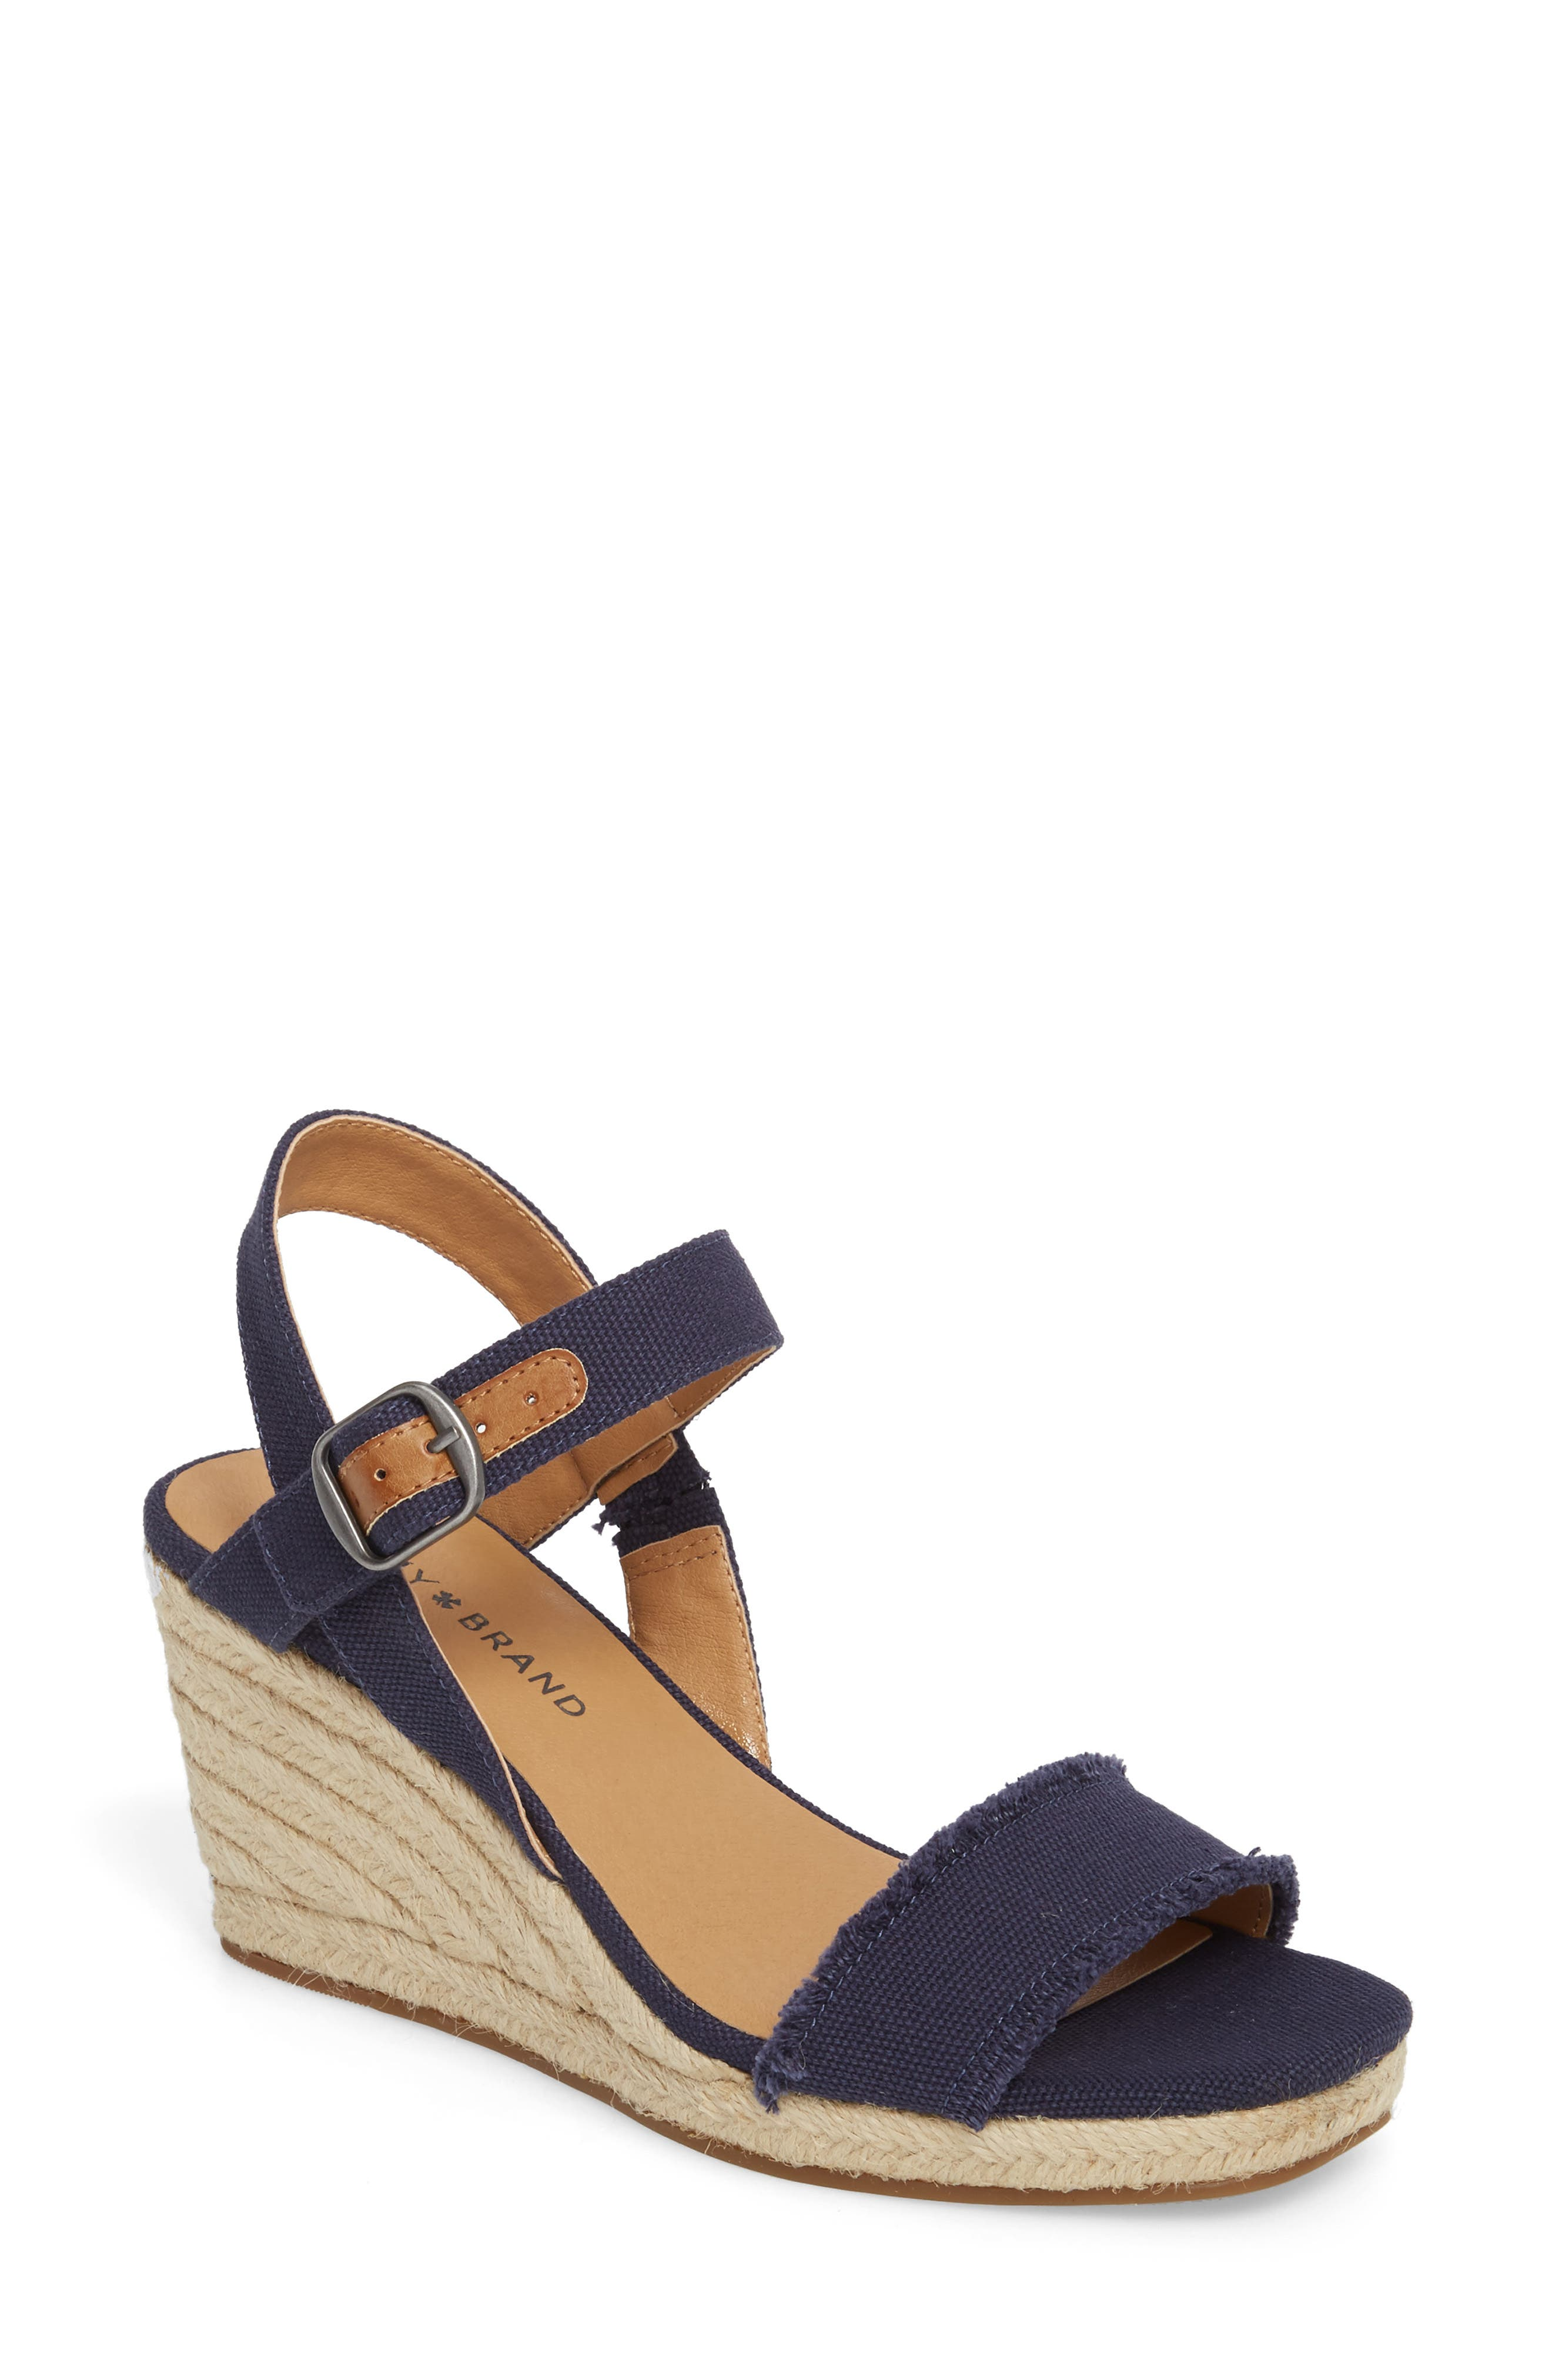 Marceline Squared Toe Wedge Sandal,                             Main thumbnail 4, color,